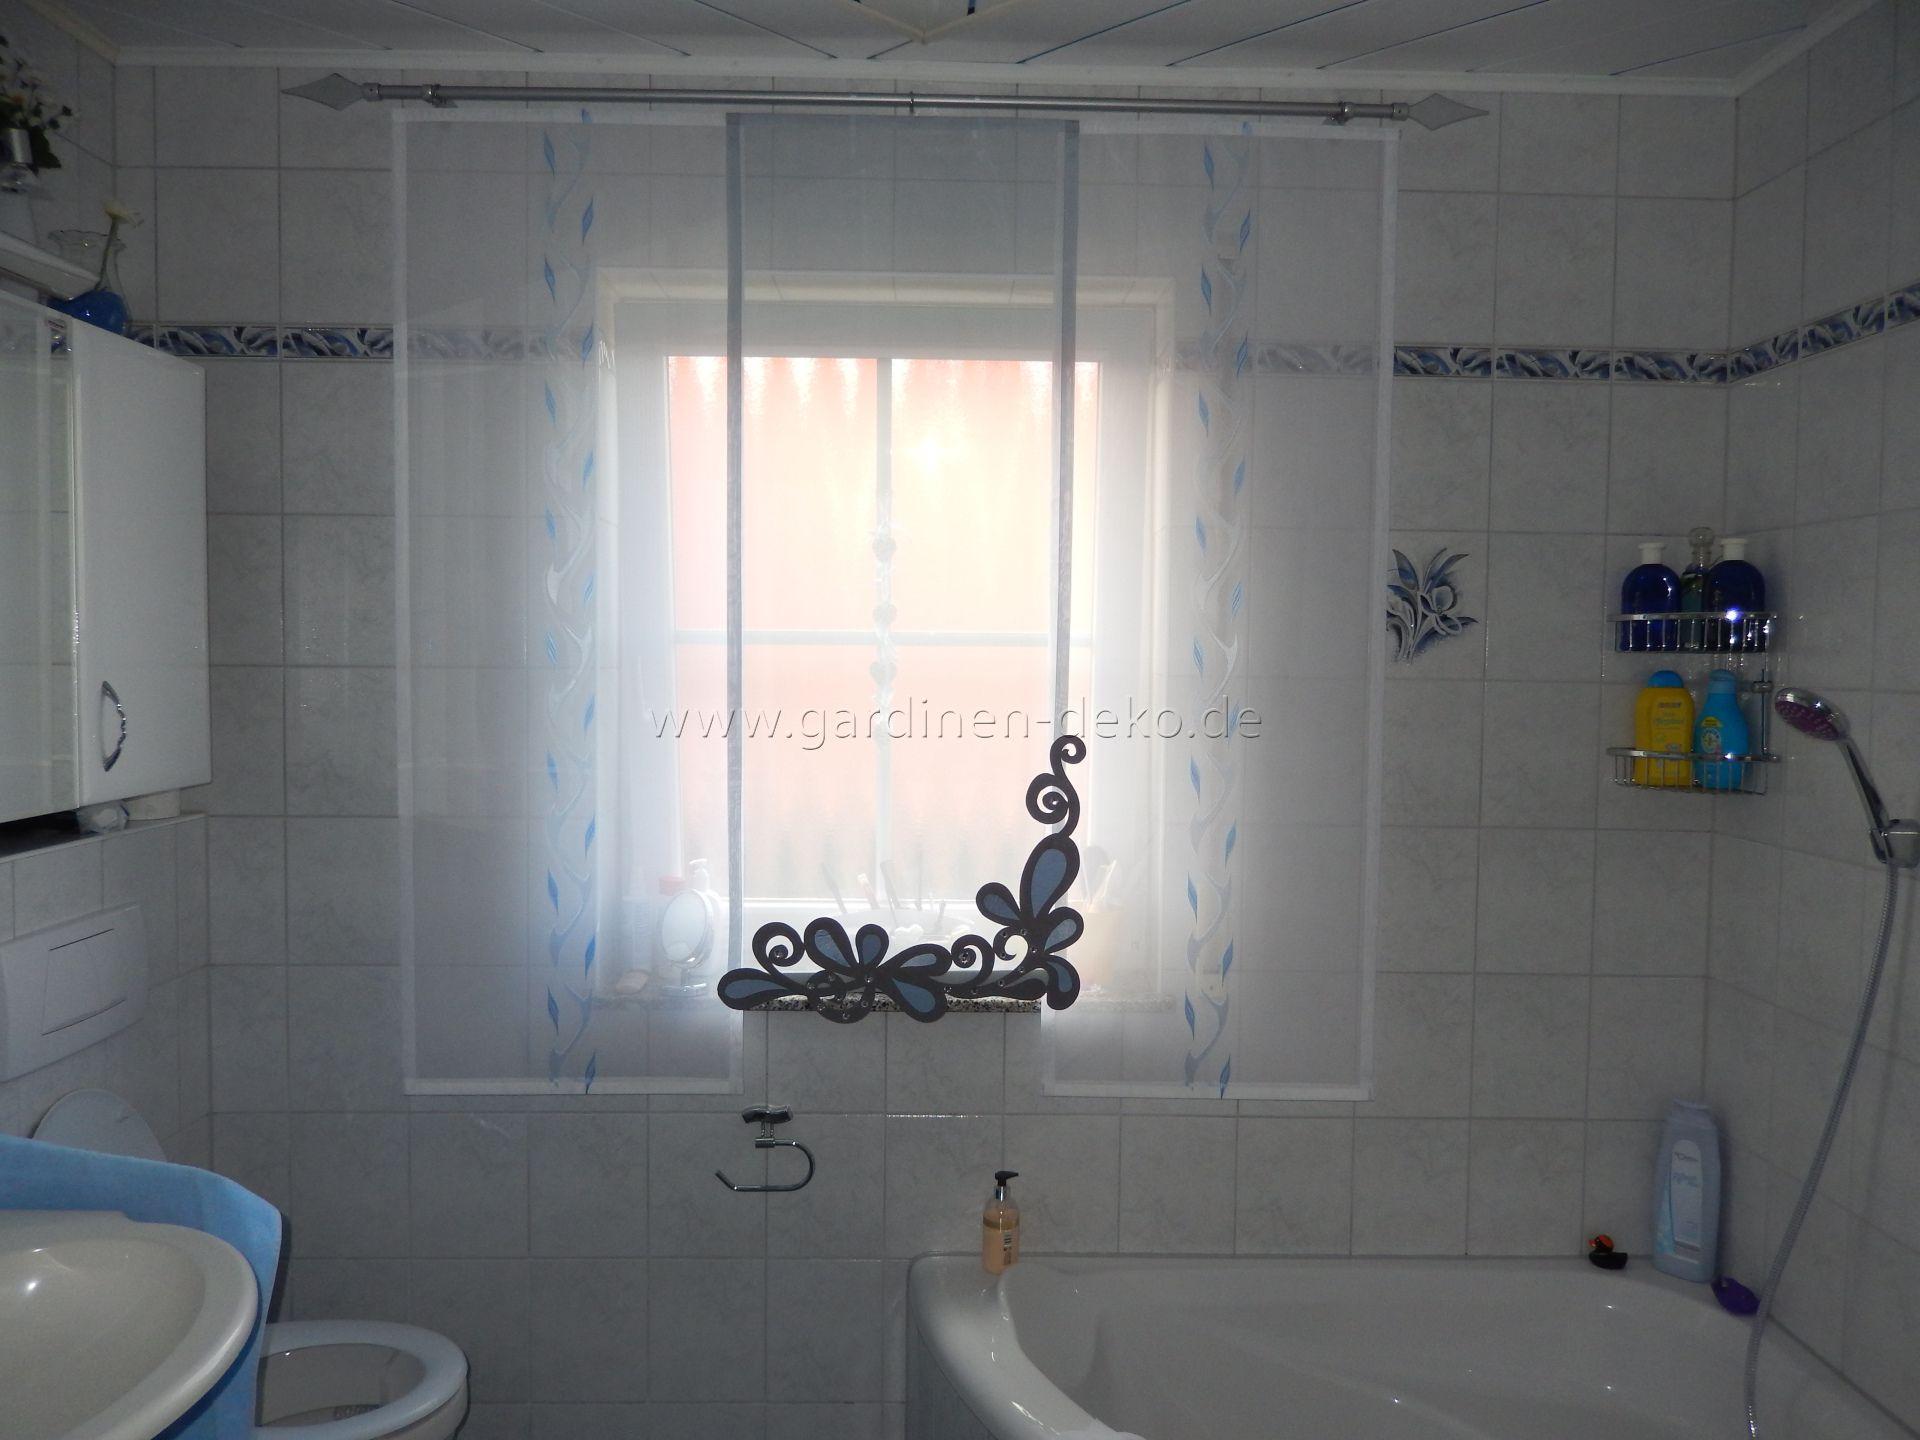 Heller Badezimmer Schiebe Vorhang In Weiss Blau Http Www Gardinen Deko De Heller Badezimmer Schiebe V Gardinen Badezimmer Badezimmer Aufbewahrung Badezimmer